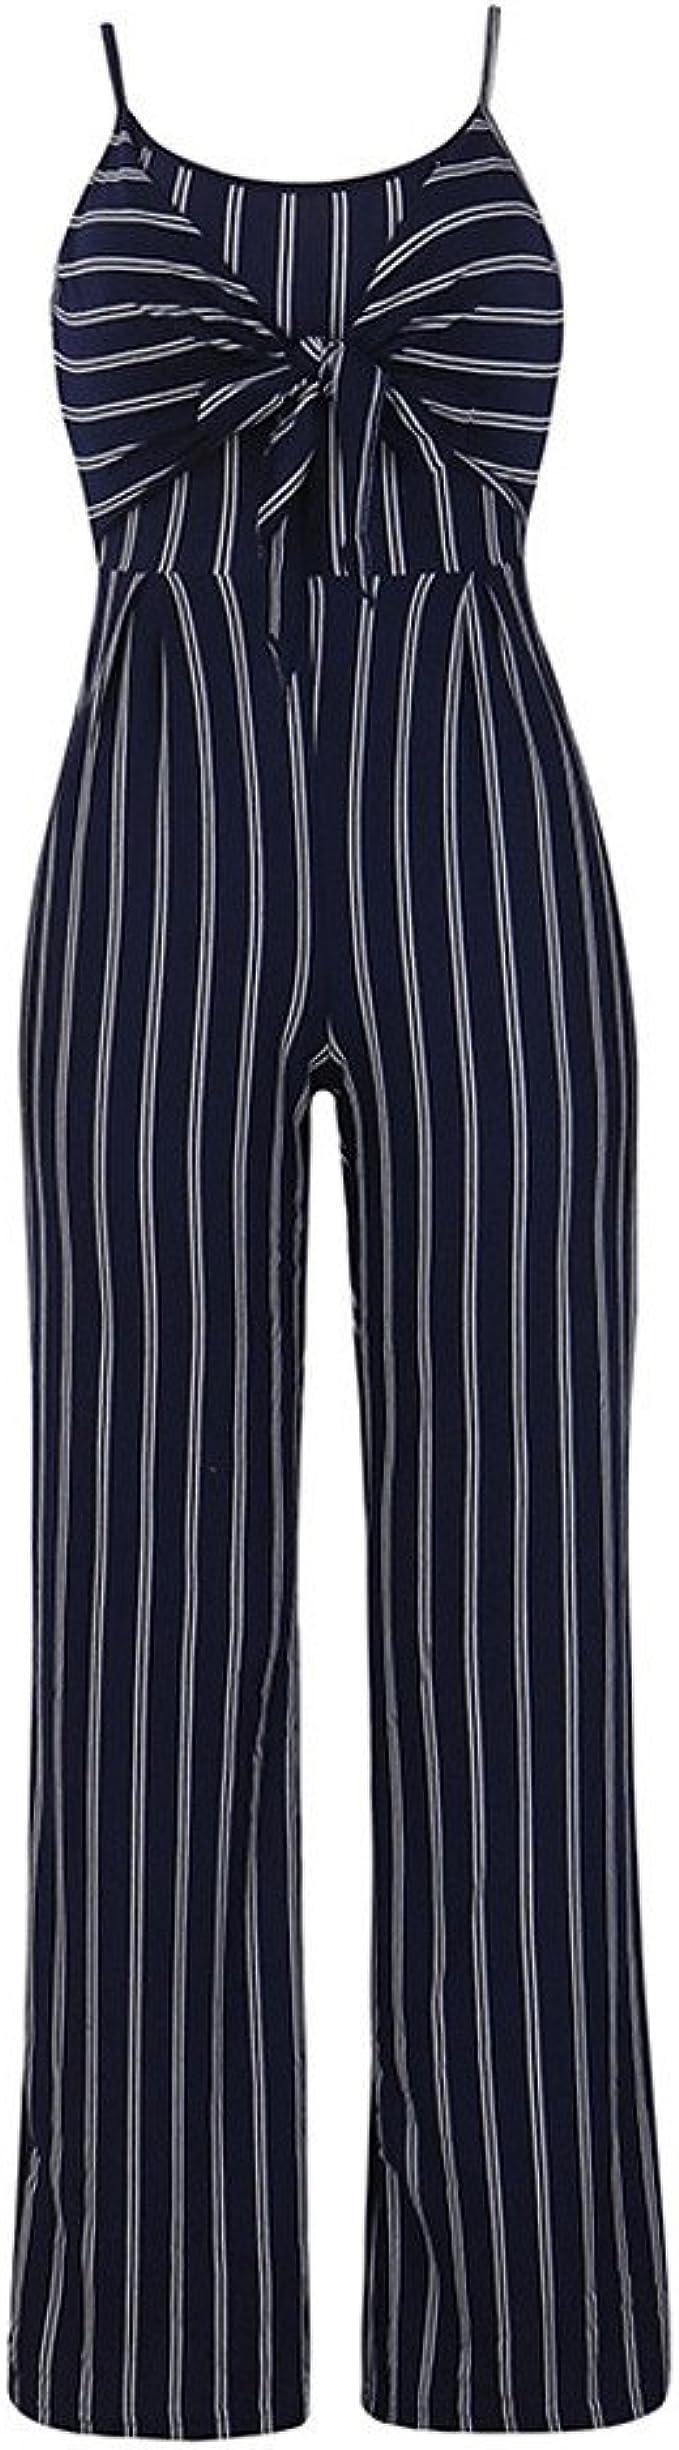 HLIYY Chic Femmes sans Manches Ray/é Combinaison Combi-Short Mesdames Casual Long Combishort Lady Pantalon Large Jambe Outfit Clubwear D/ét/é V/êtements